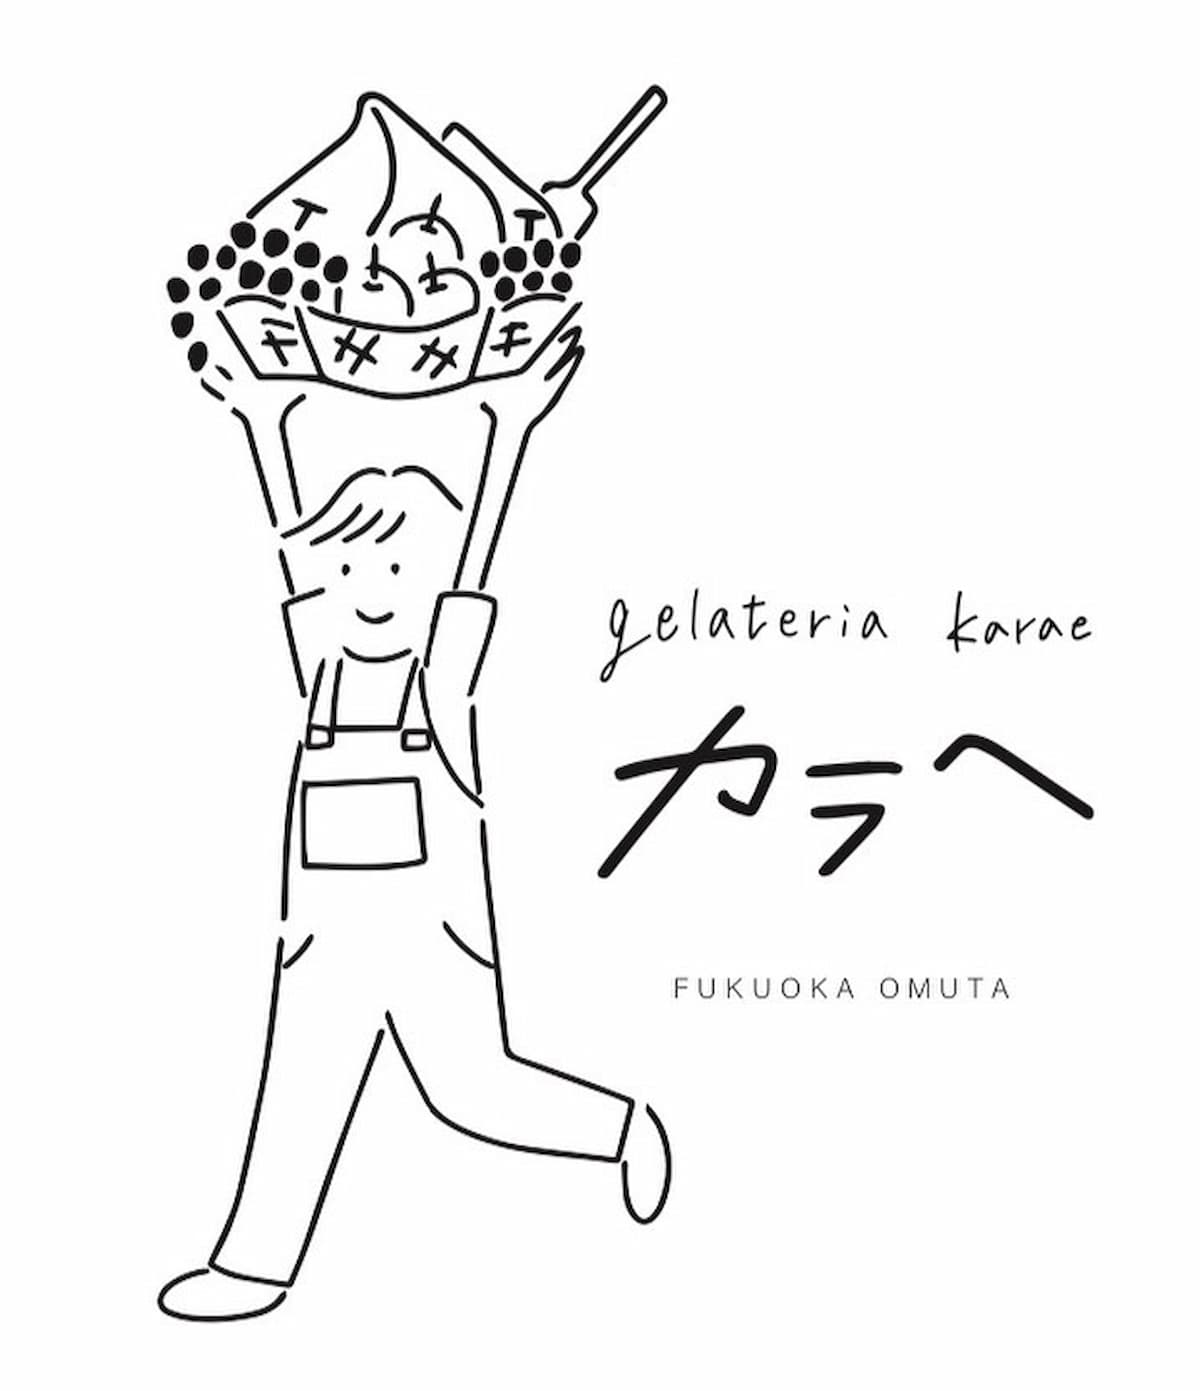 gelateria カラヘってジェラートショップが出来てる。10月9日オープン(大牟田市)